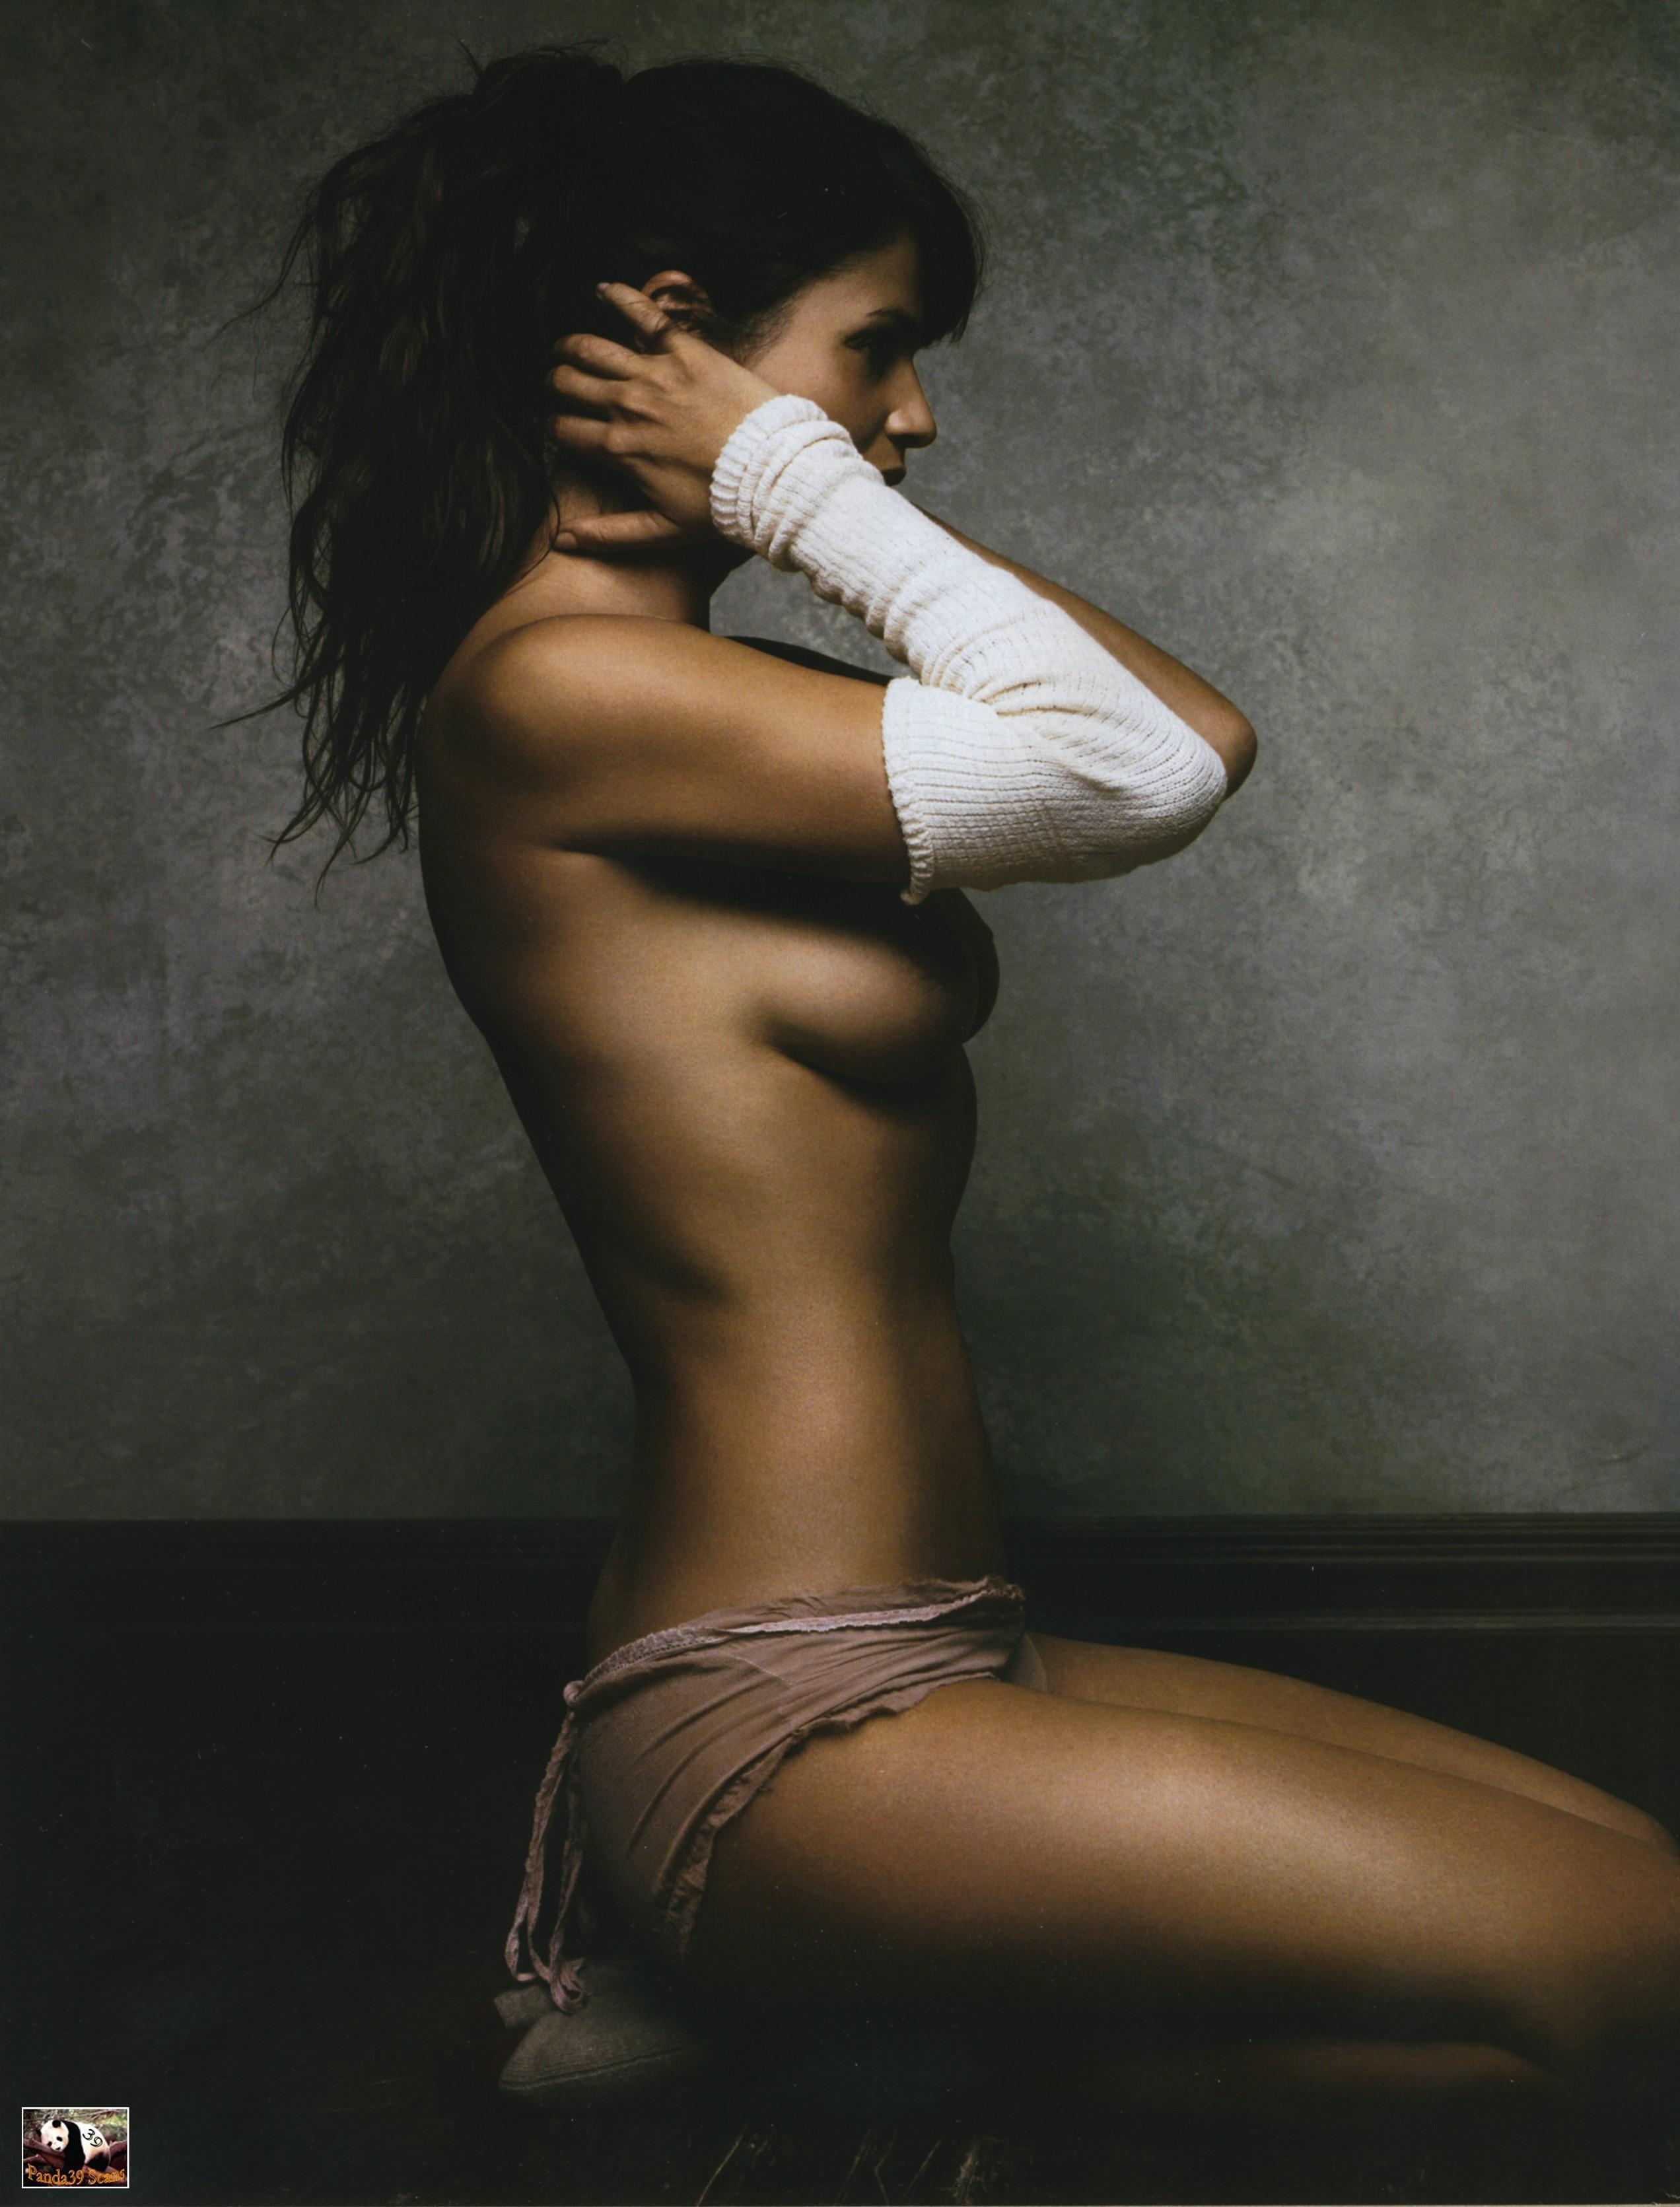 Хелена дженсен в порно 10 фотография